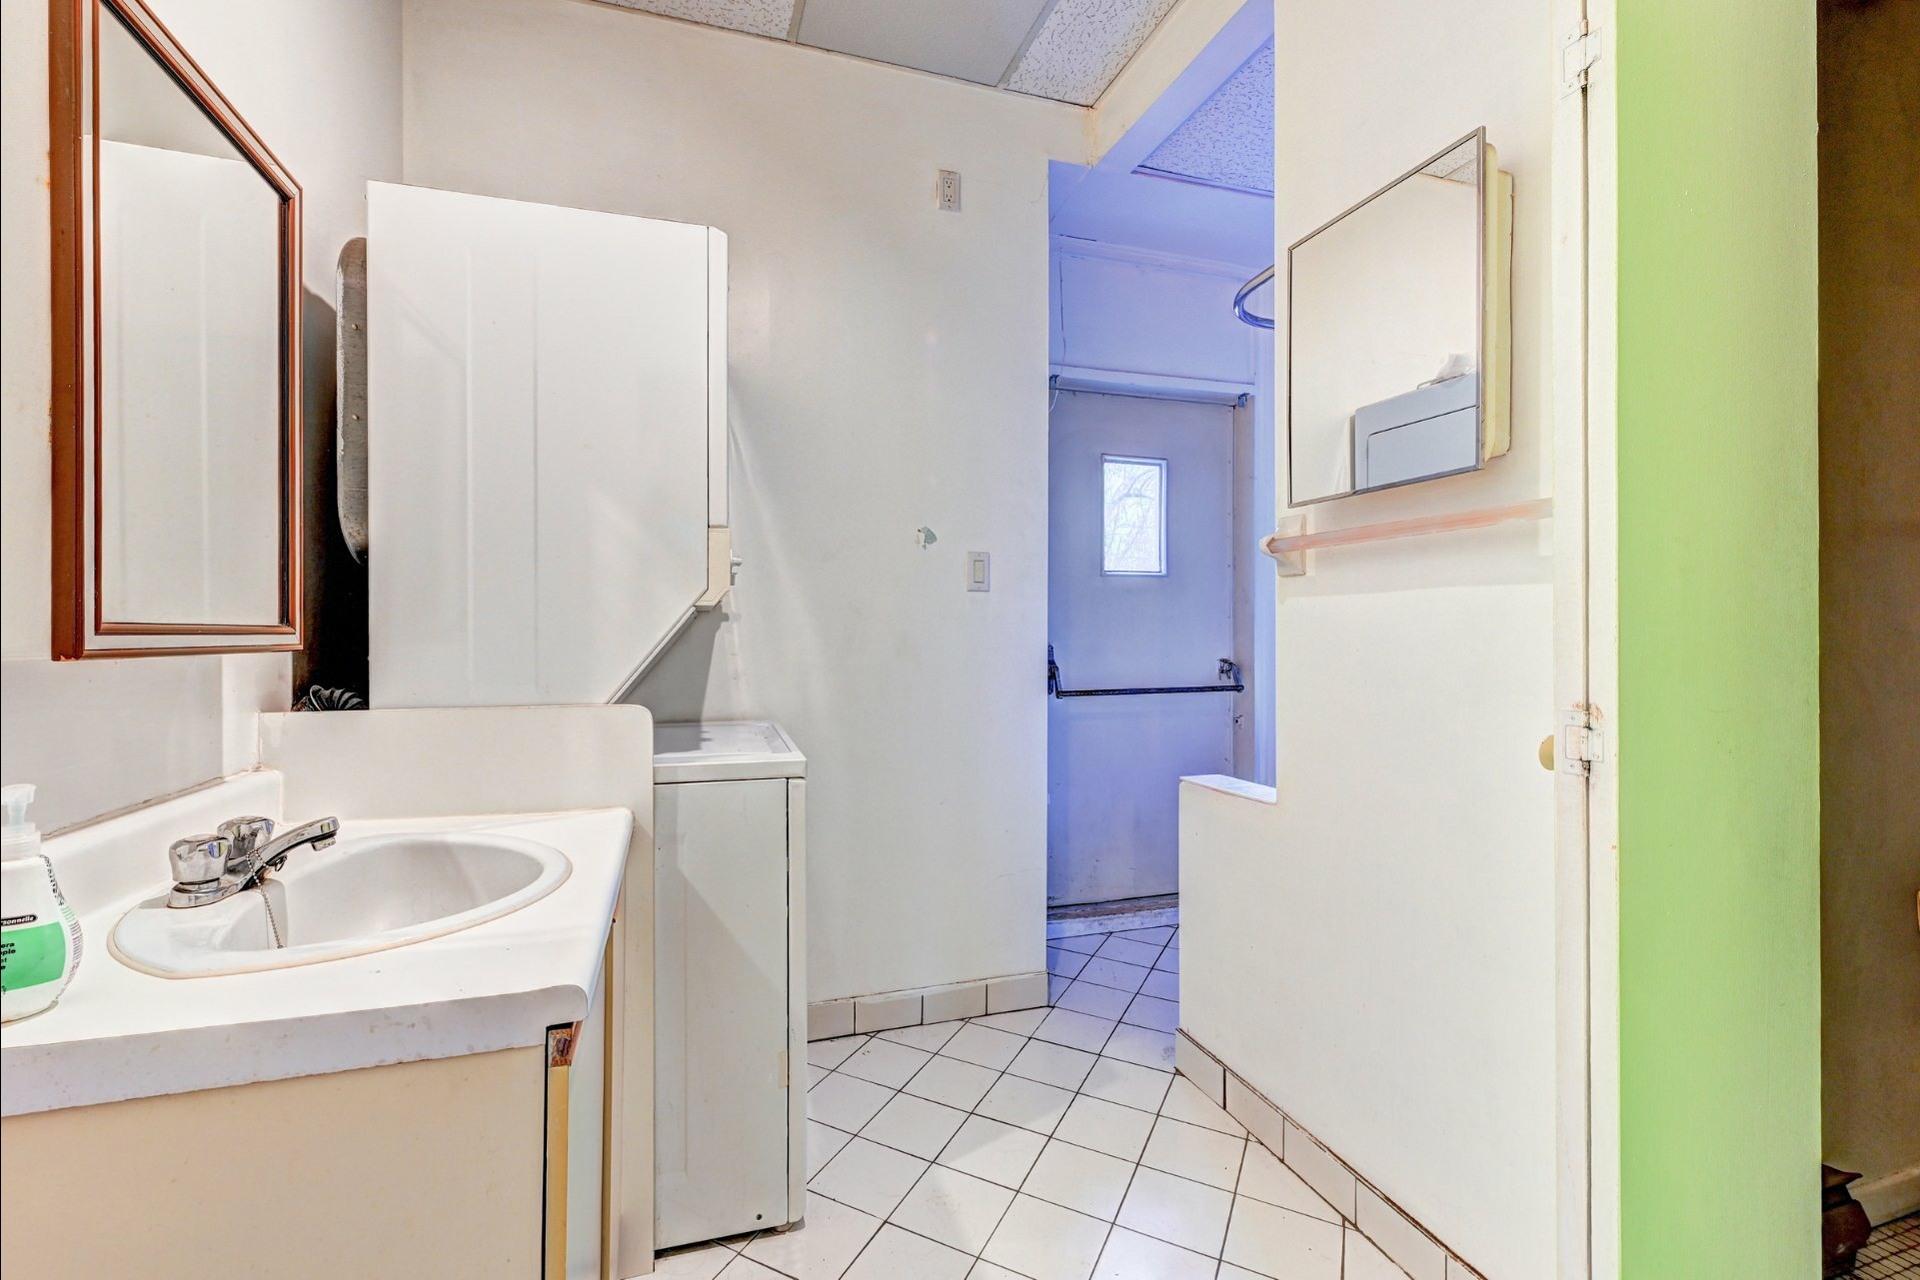 image 7 - Departamento Para alquiler Ville-Marie Montréal  - 4 habitaciones